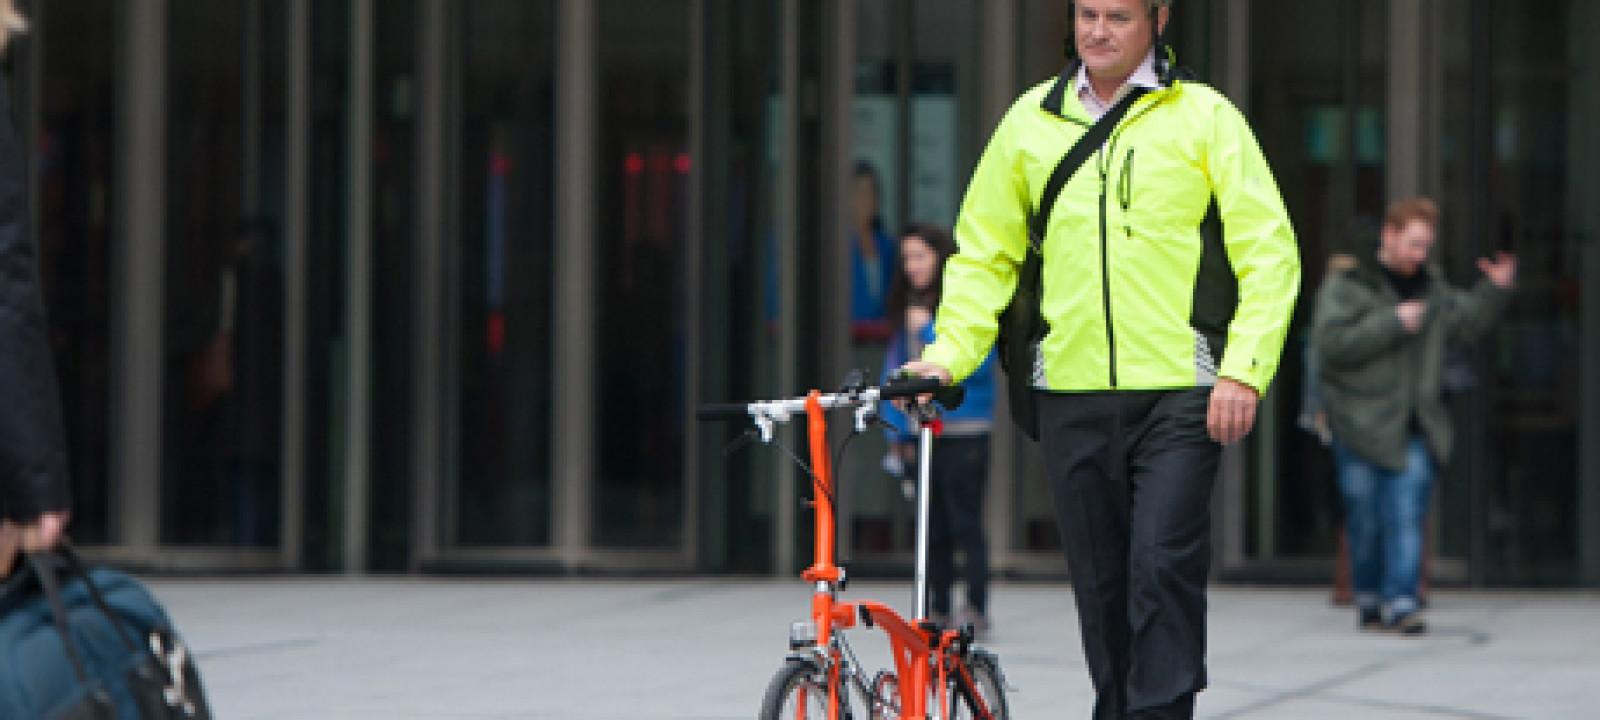 Hugh Bonneville cycling through courtyard at BBC studios, London